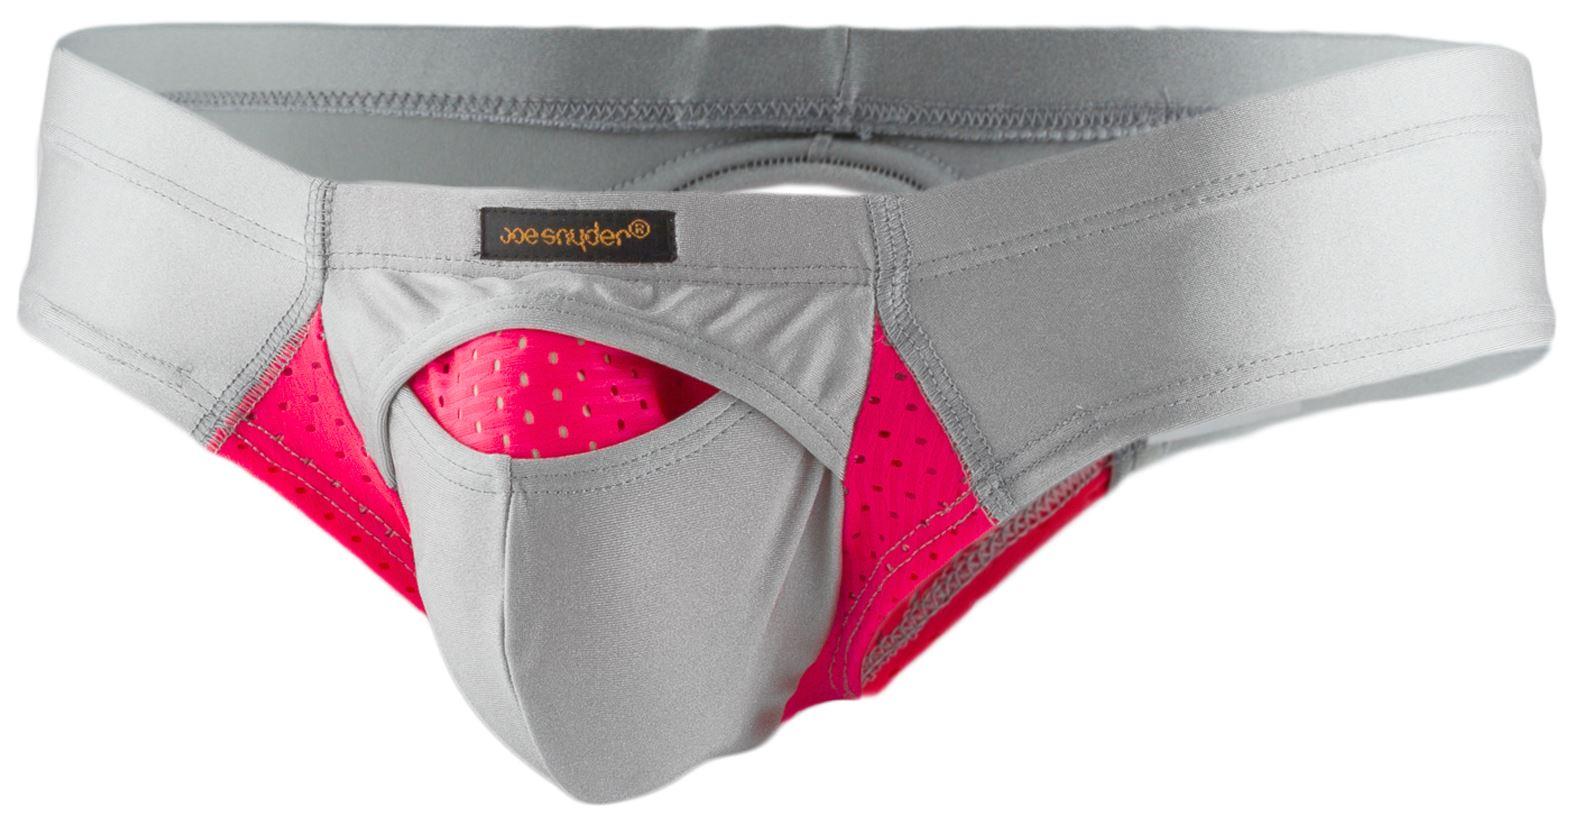 Joe Snyder Sexiest Mini Cheek SXT-04 mens underwear slip enhance brief high cut